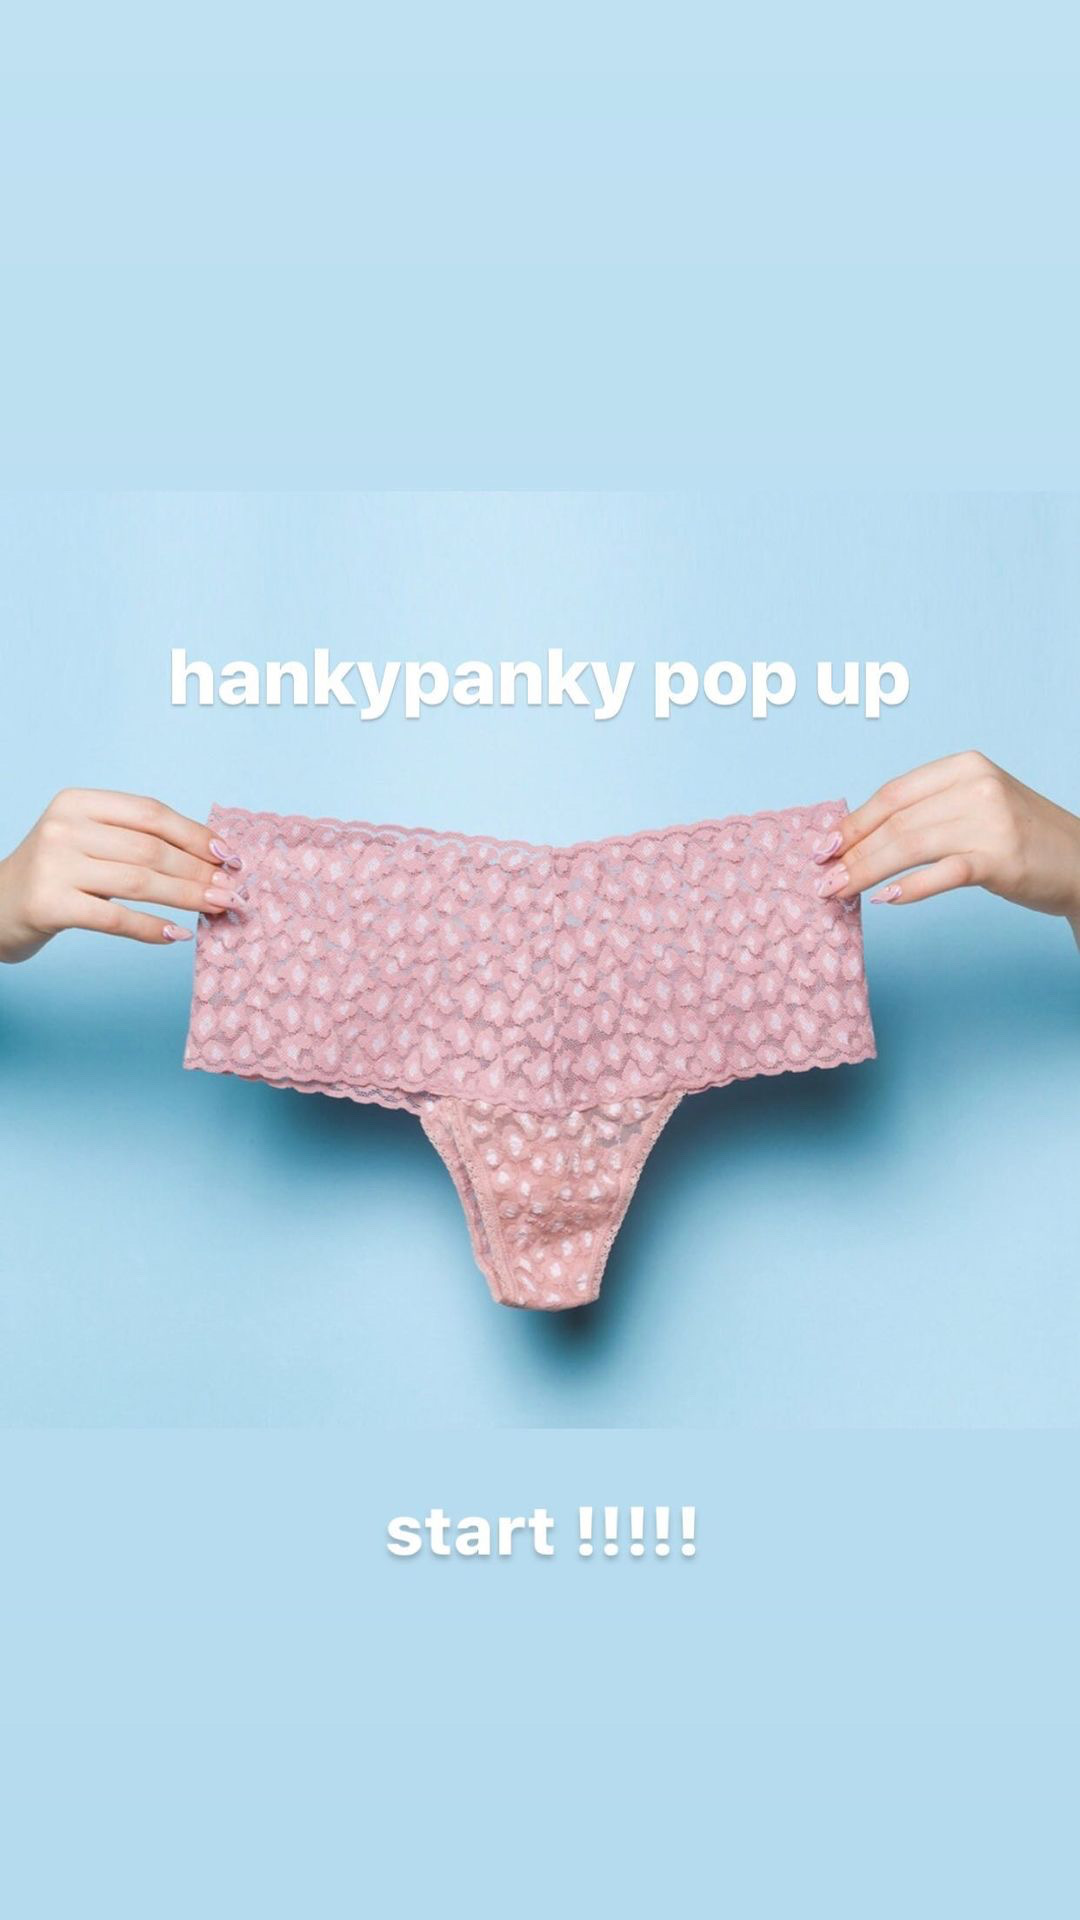 【hankypanky pop up】